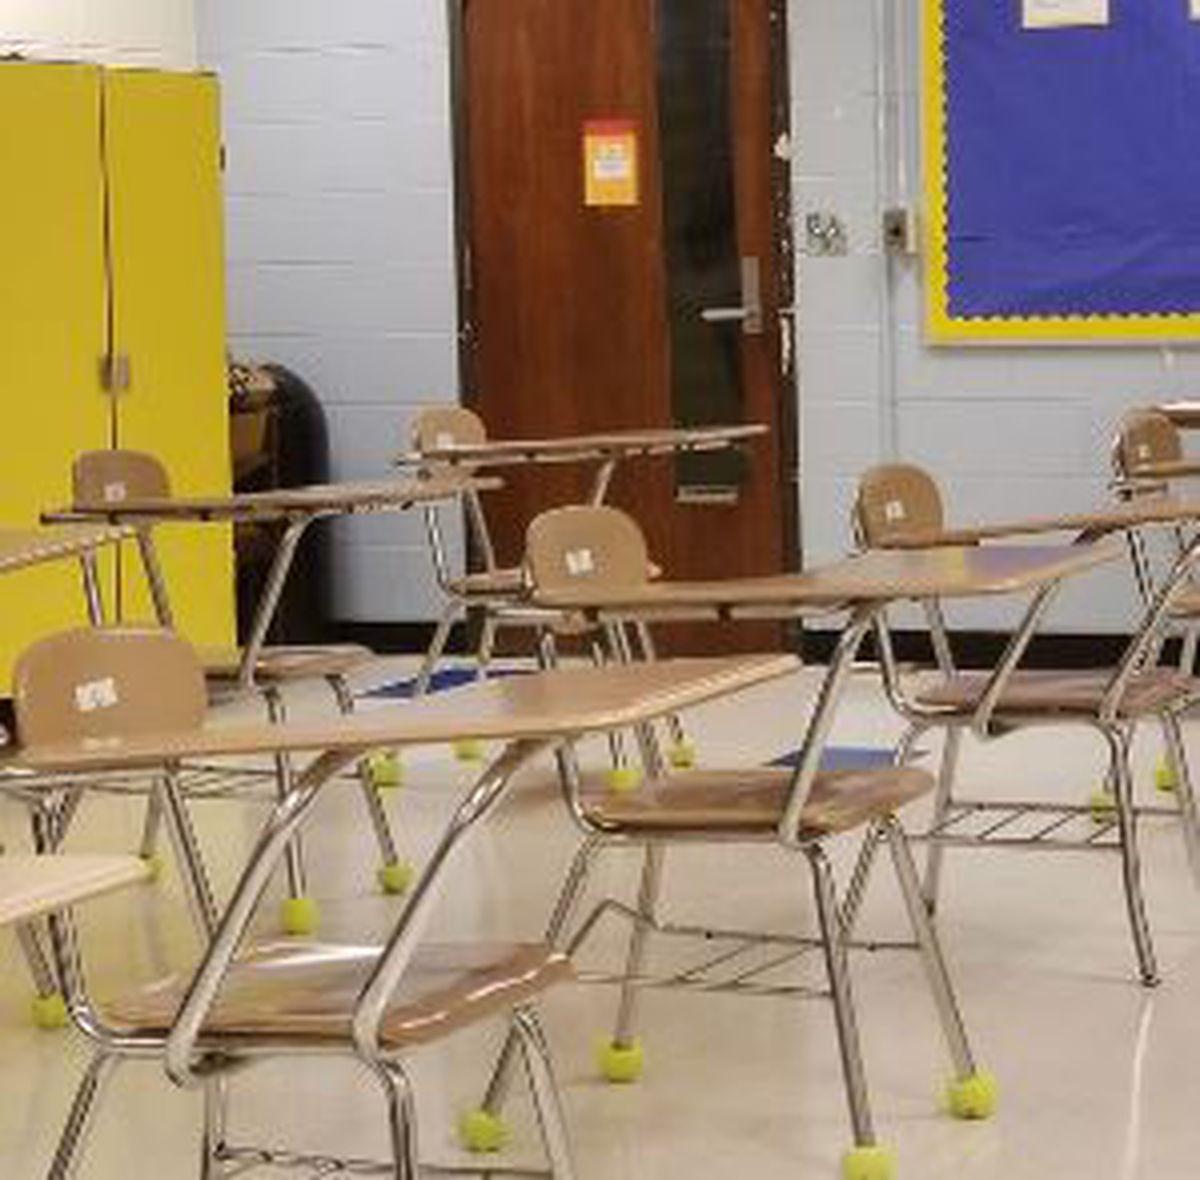 Treadmill Desk Programmer: Community Classroom: Teacher Wants Exercise Equipment For